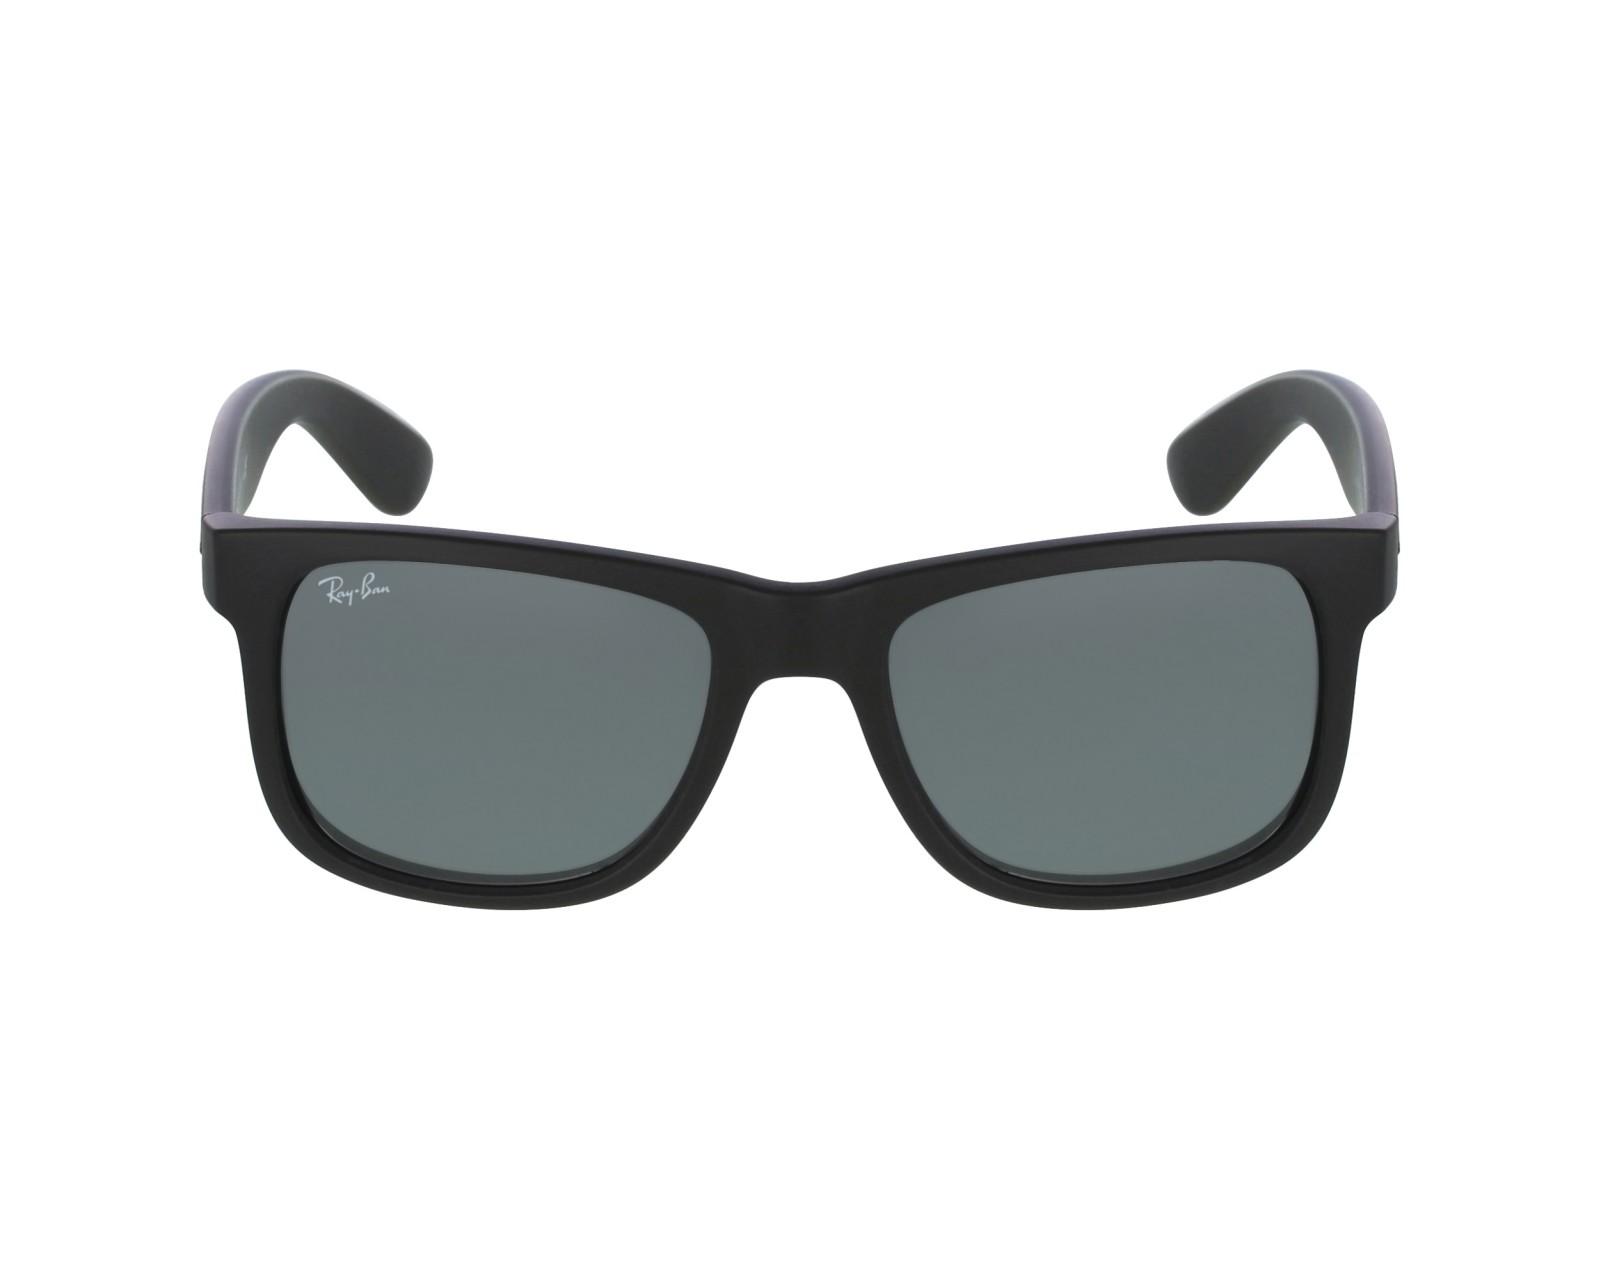 ad14f1e8776 thumbnail Sunglasses Ray-Ban RB-4165 622 6G - Black profile view